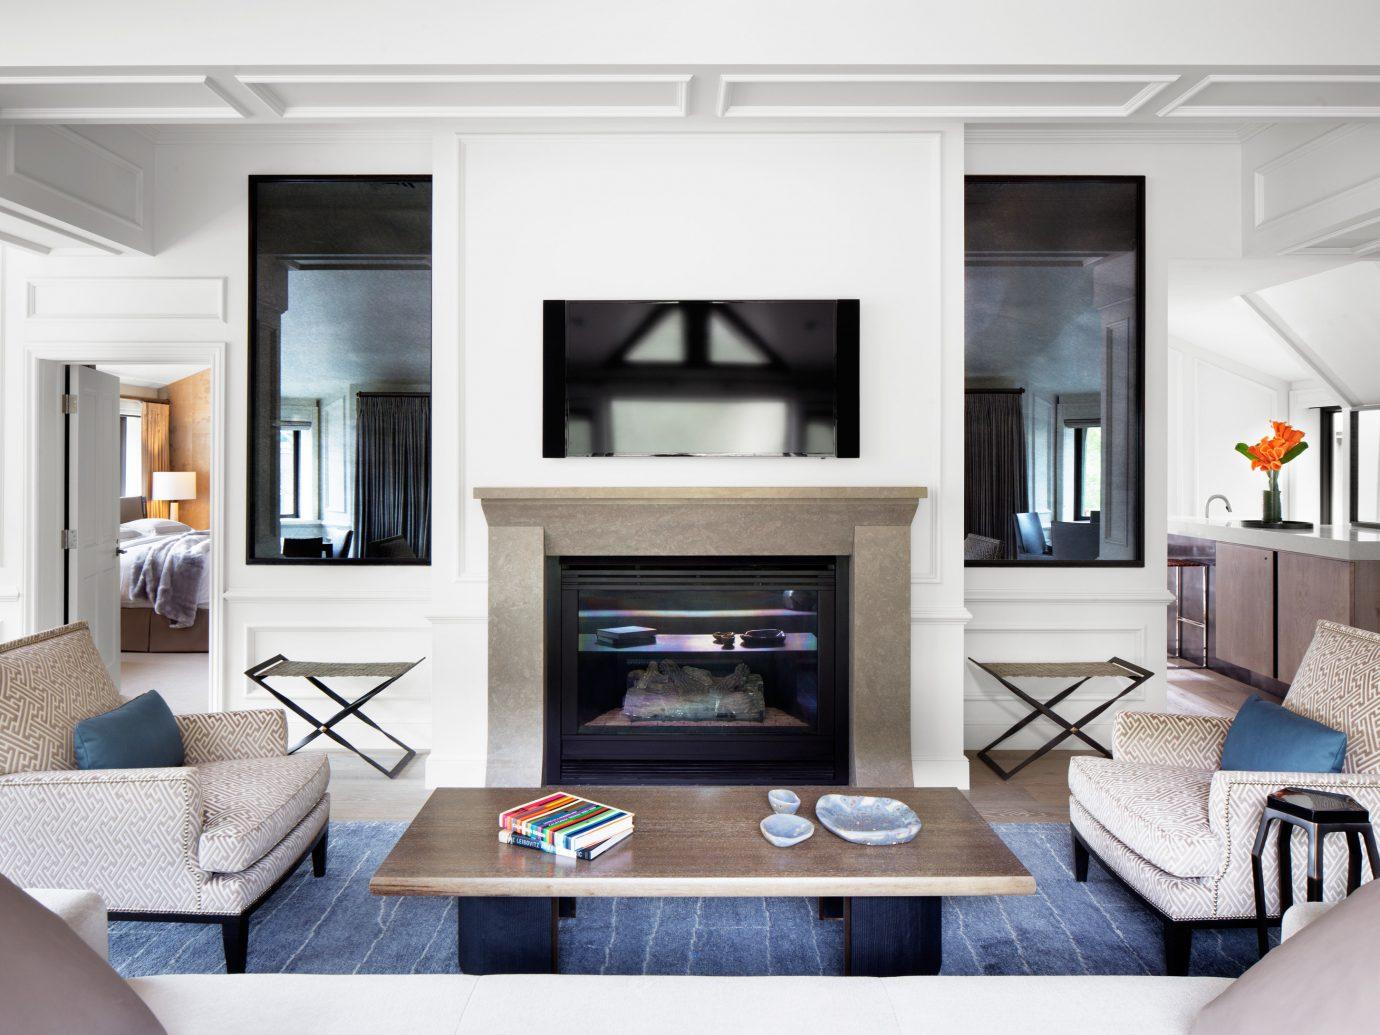 Celebs Hotels Trip Ideas living room indoor floor room Living window furniture home interior design Design Fireplace table